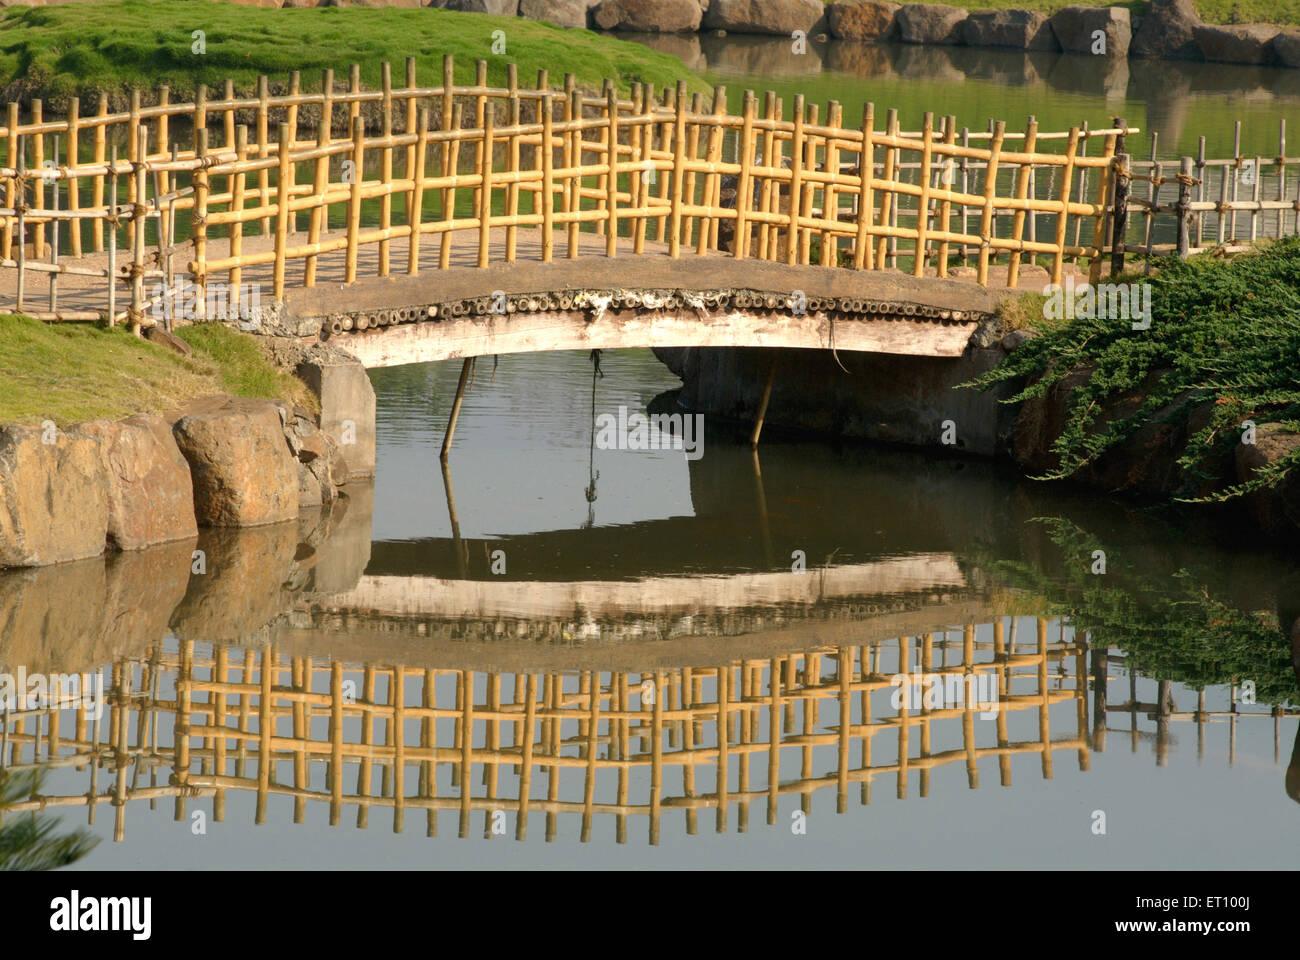 Bridge over pond in okayama friendship or p l. deshpande garden ...